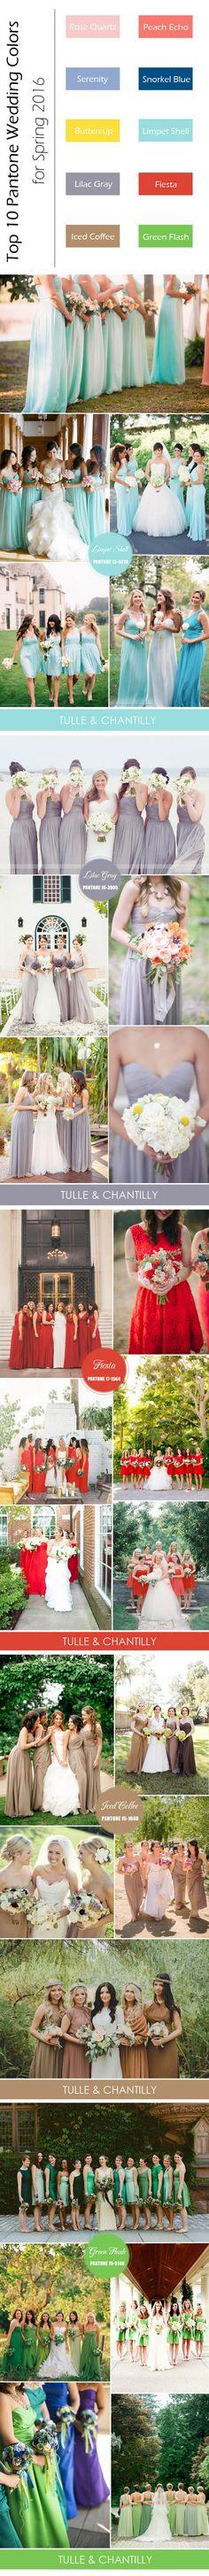 top 10 Pantone spring summer wedding colors for bridesmaid dresses 2016